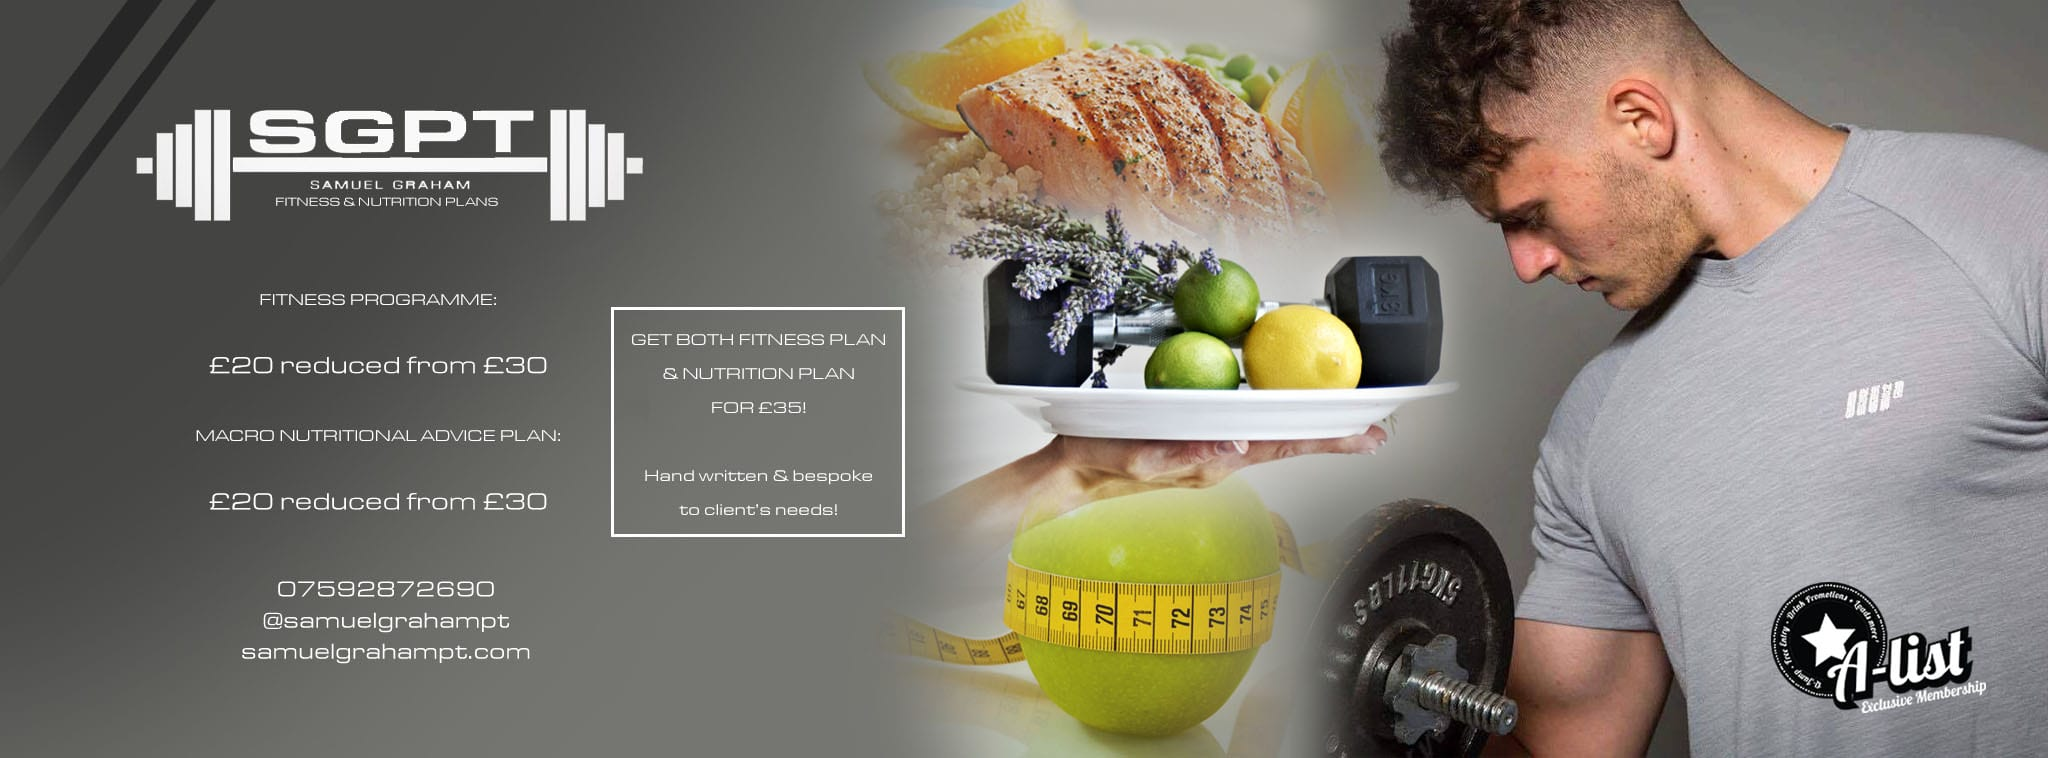 SGPT Fitness & Nutrition Plans